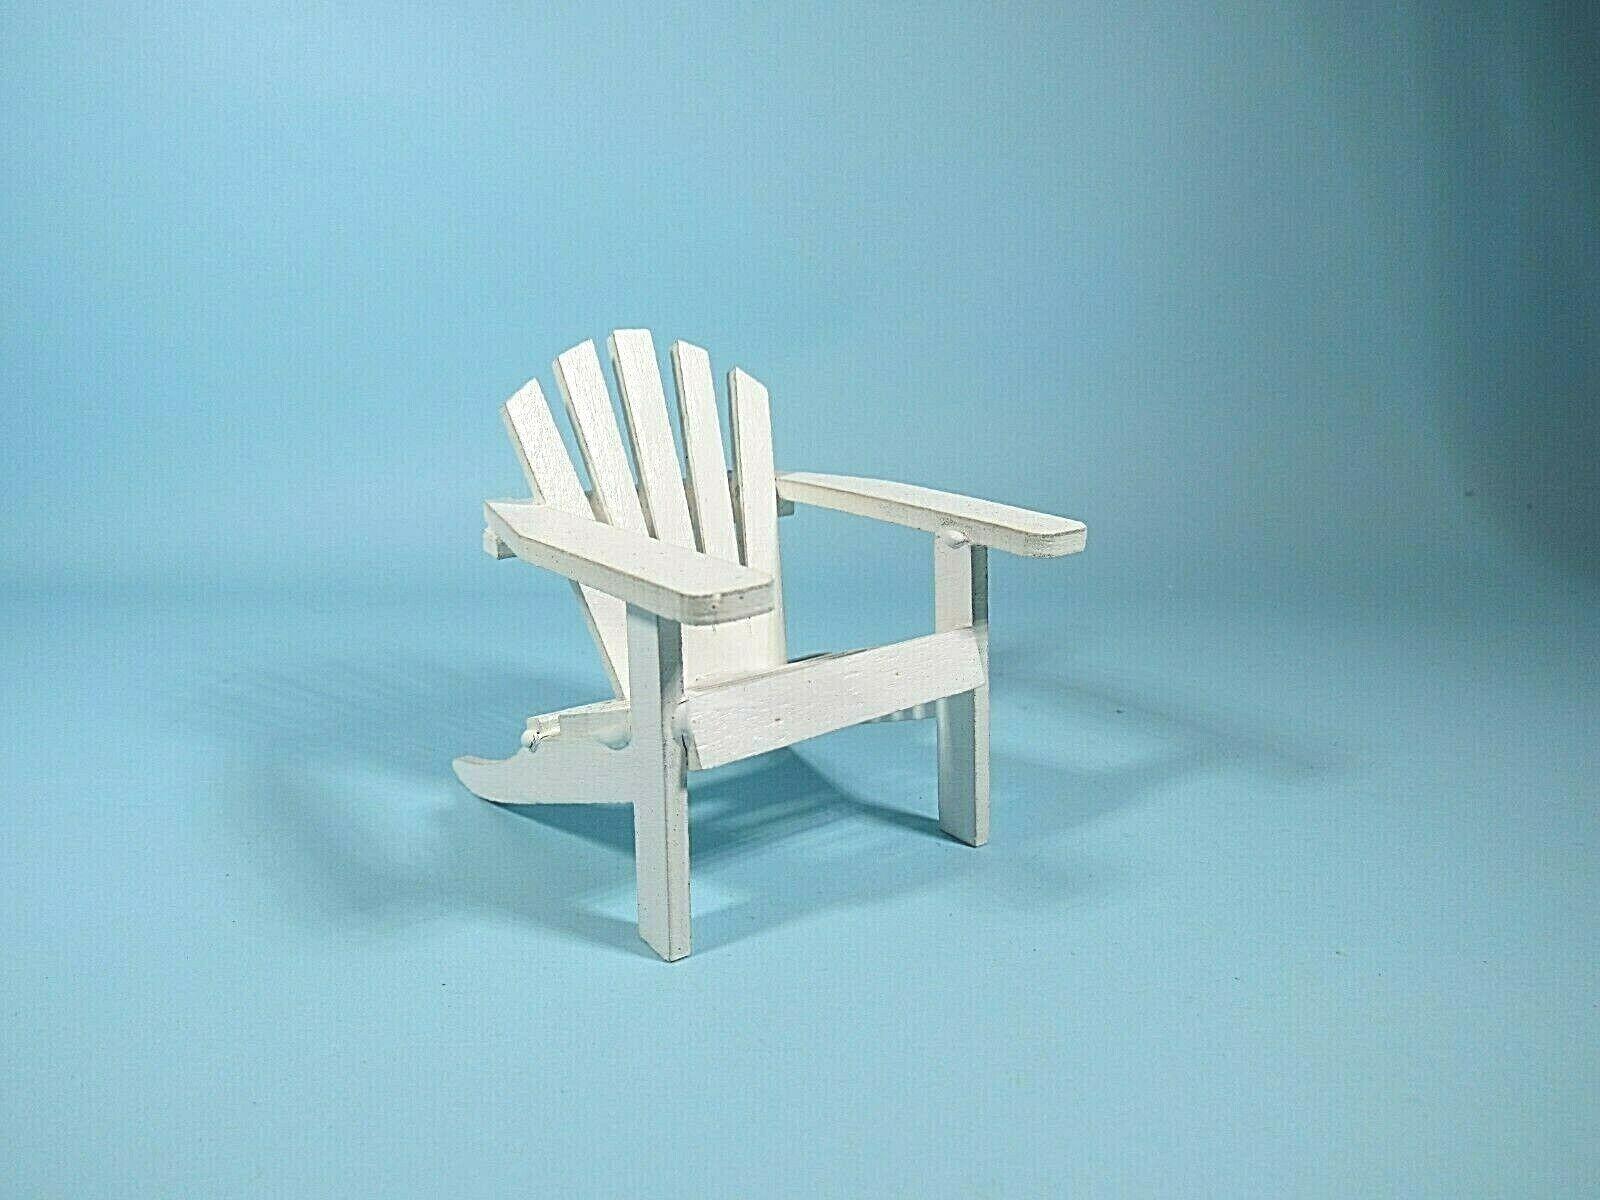 Heavy Duty Sun Lounger, Corona Adirondack Chair White Cedar Wood For Sale Online Ebay